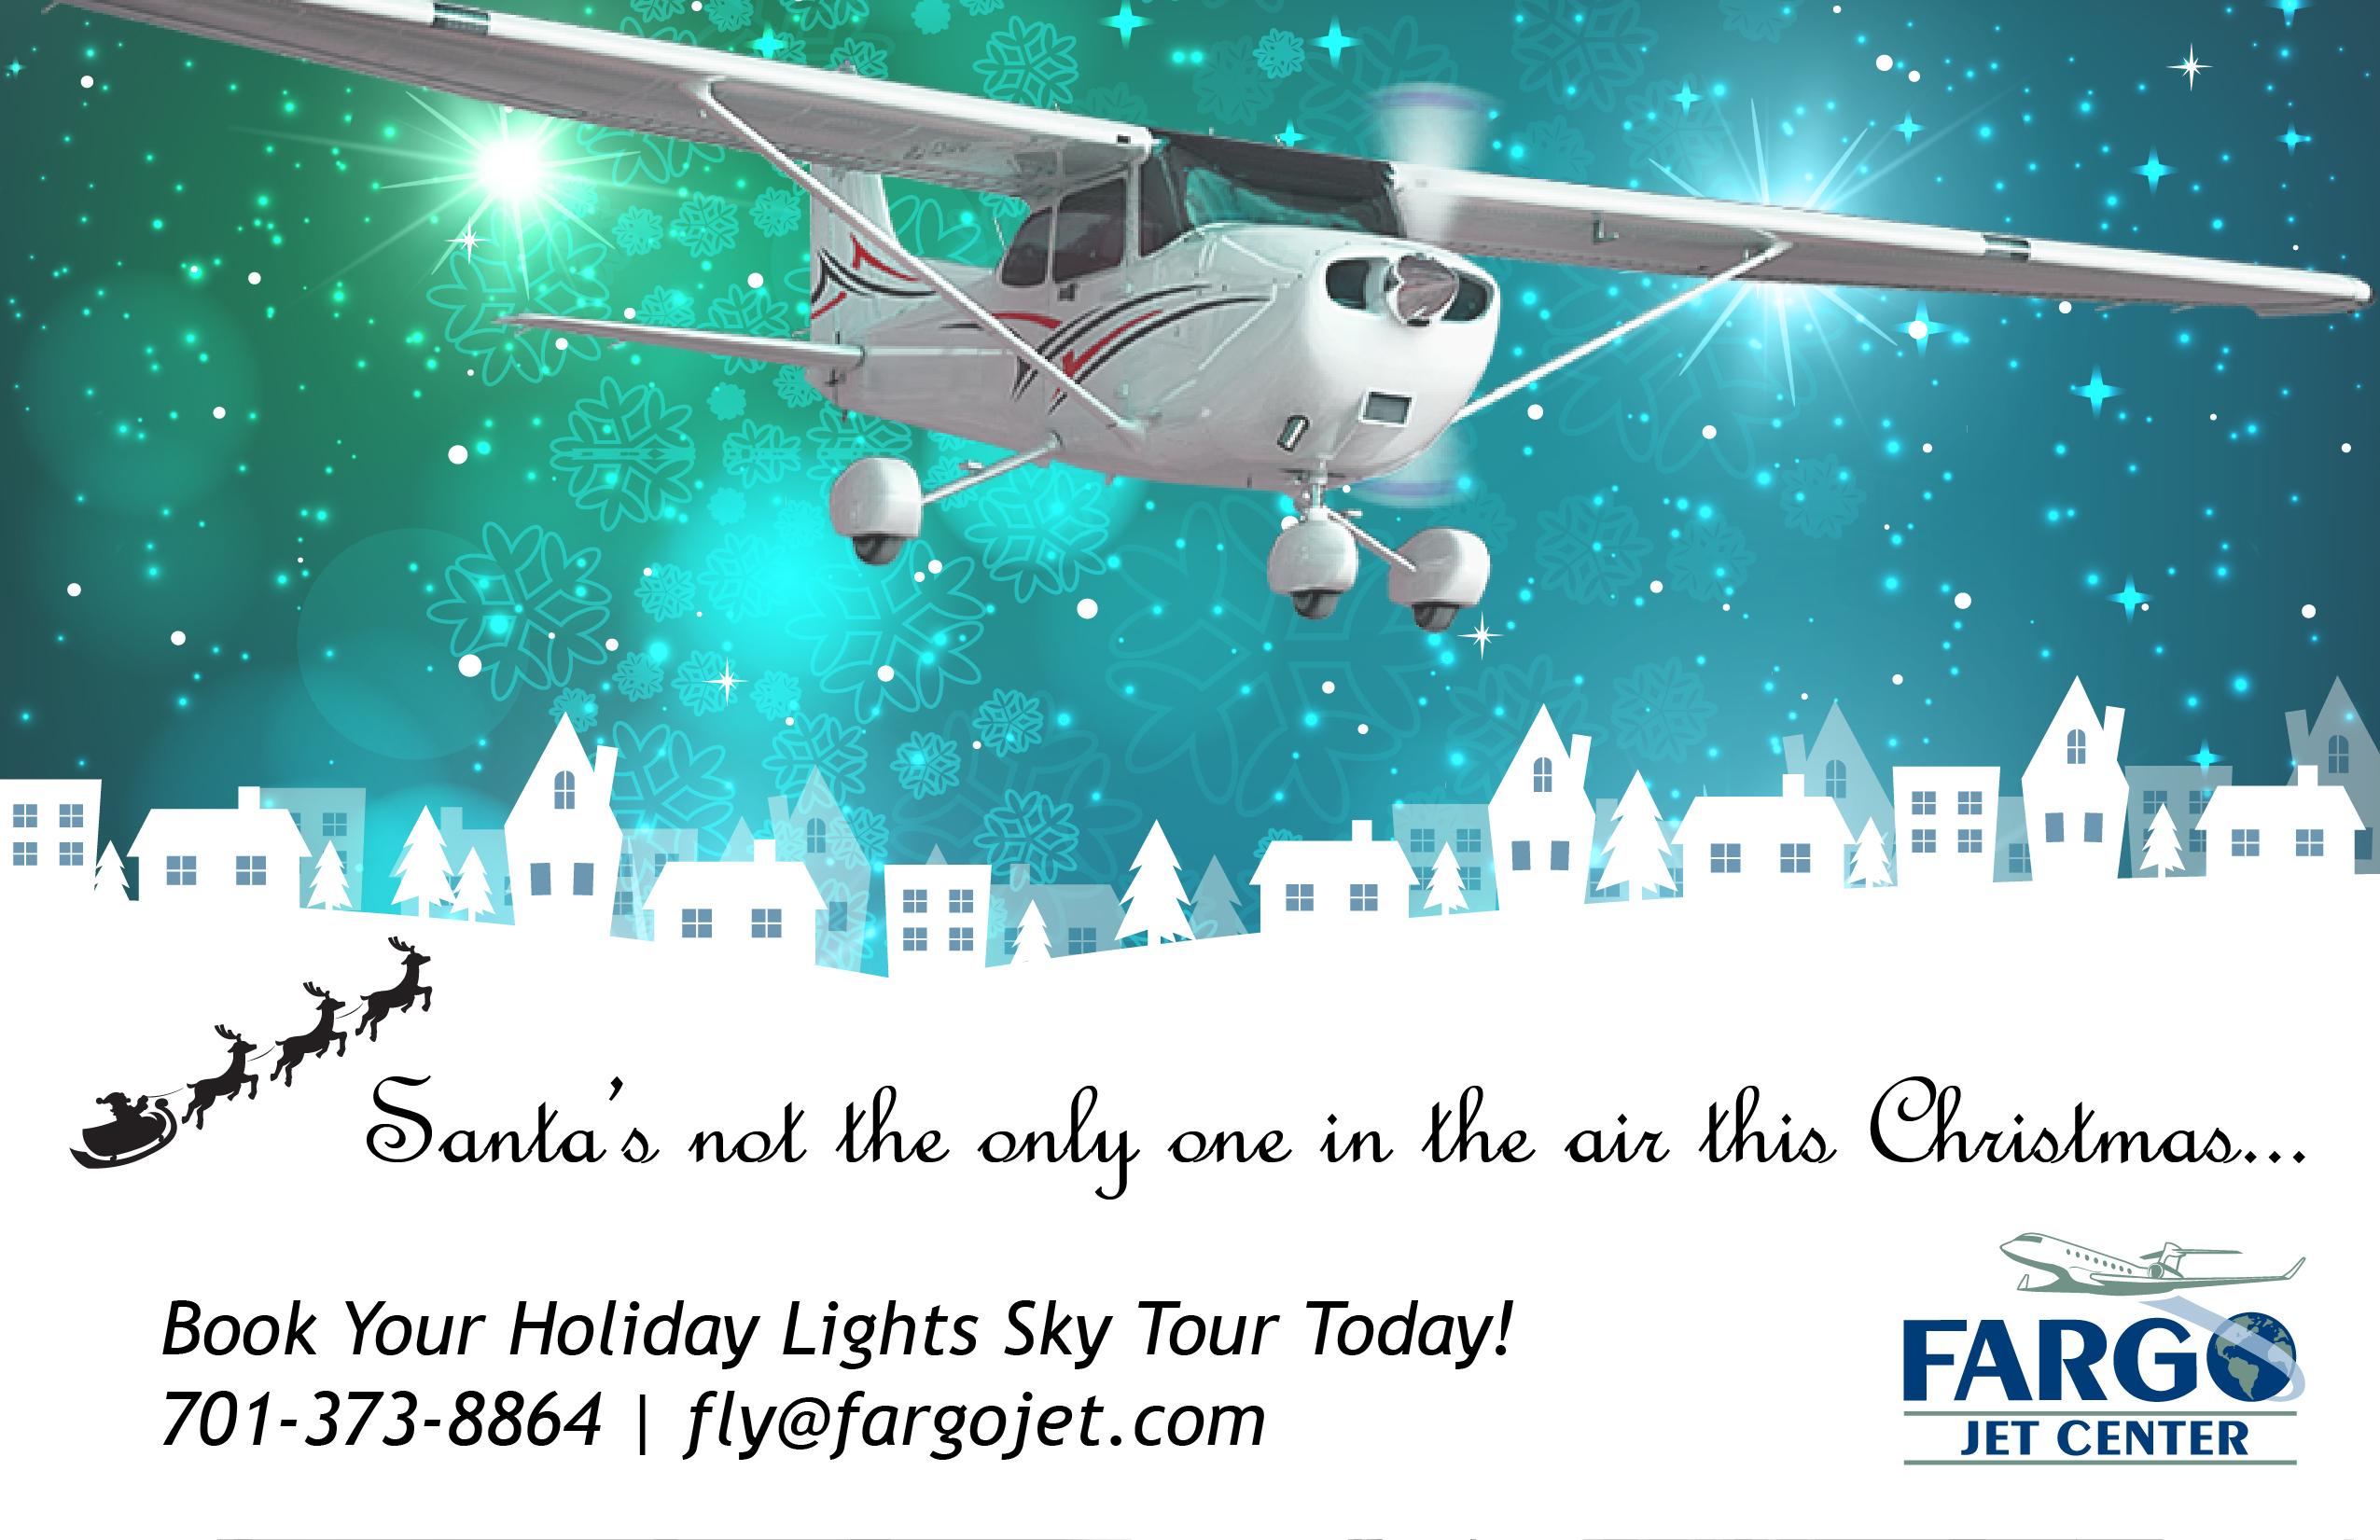 fargo-jet-center-holiday-lights-tour